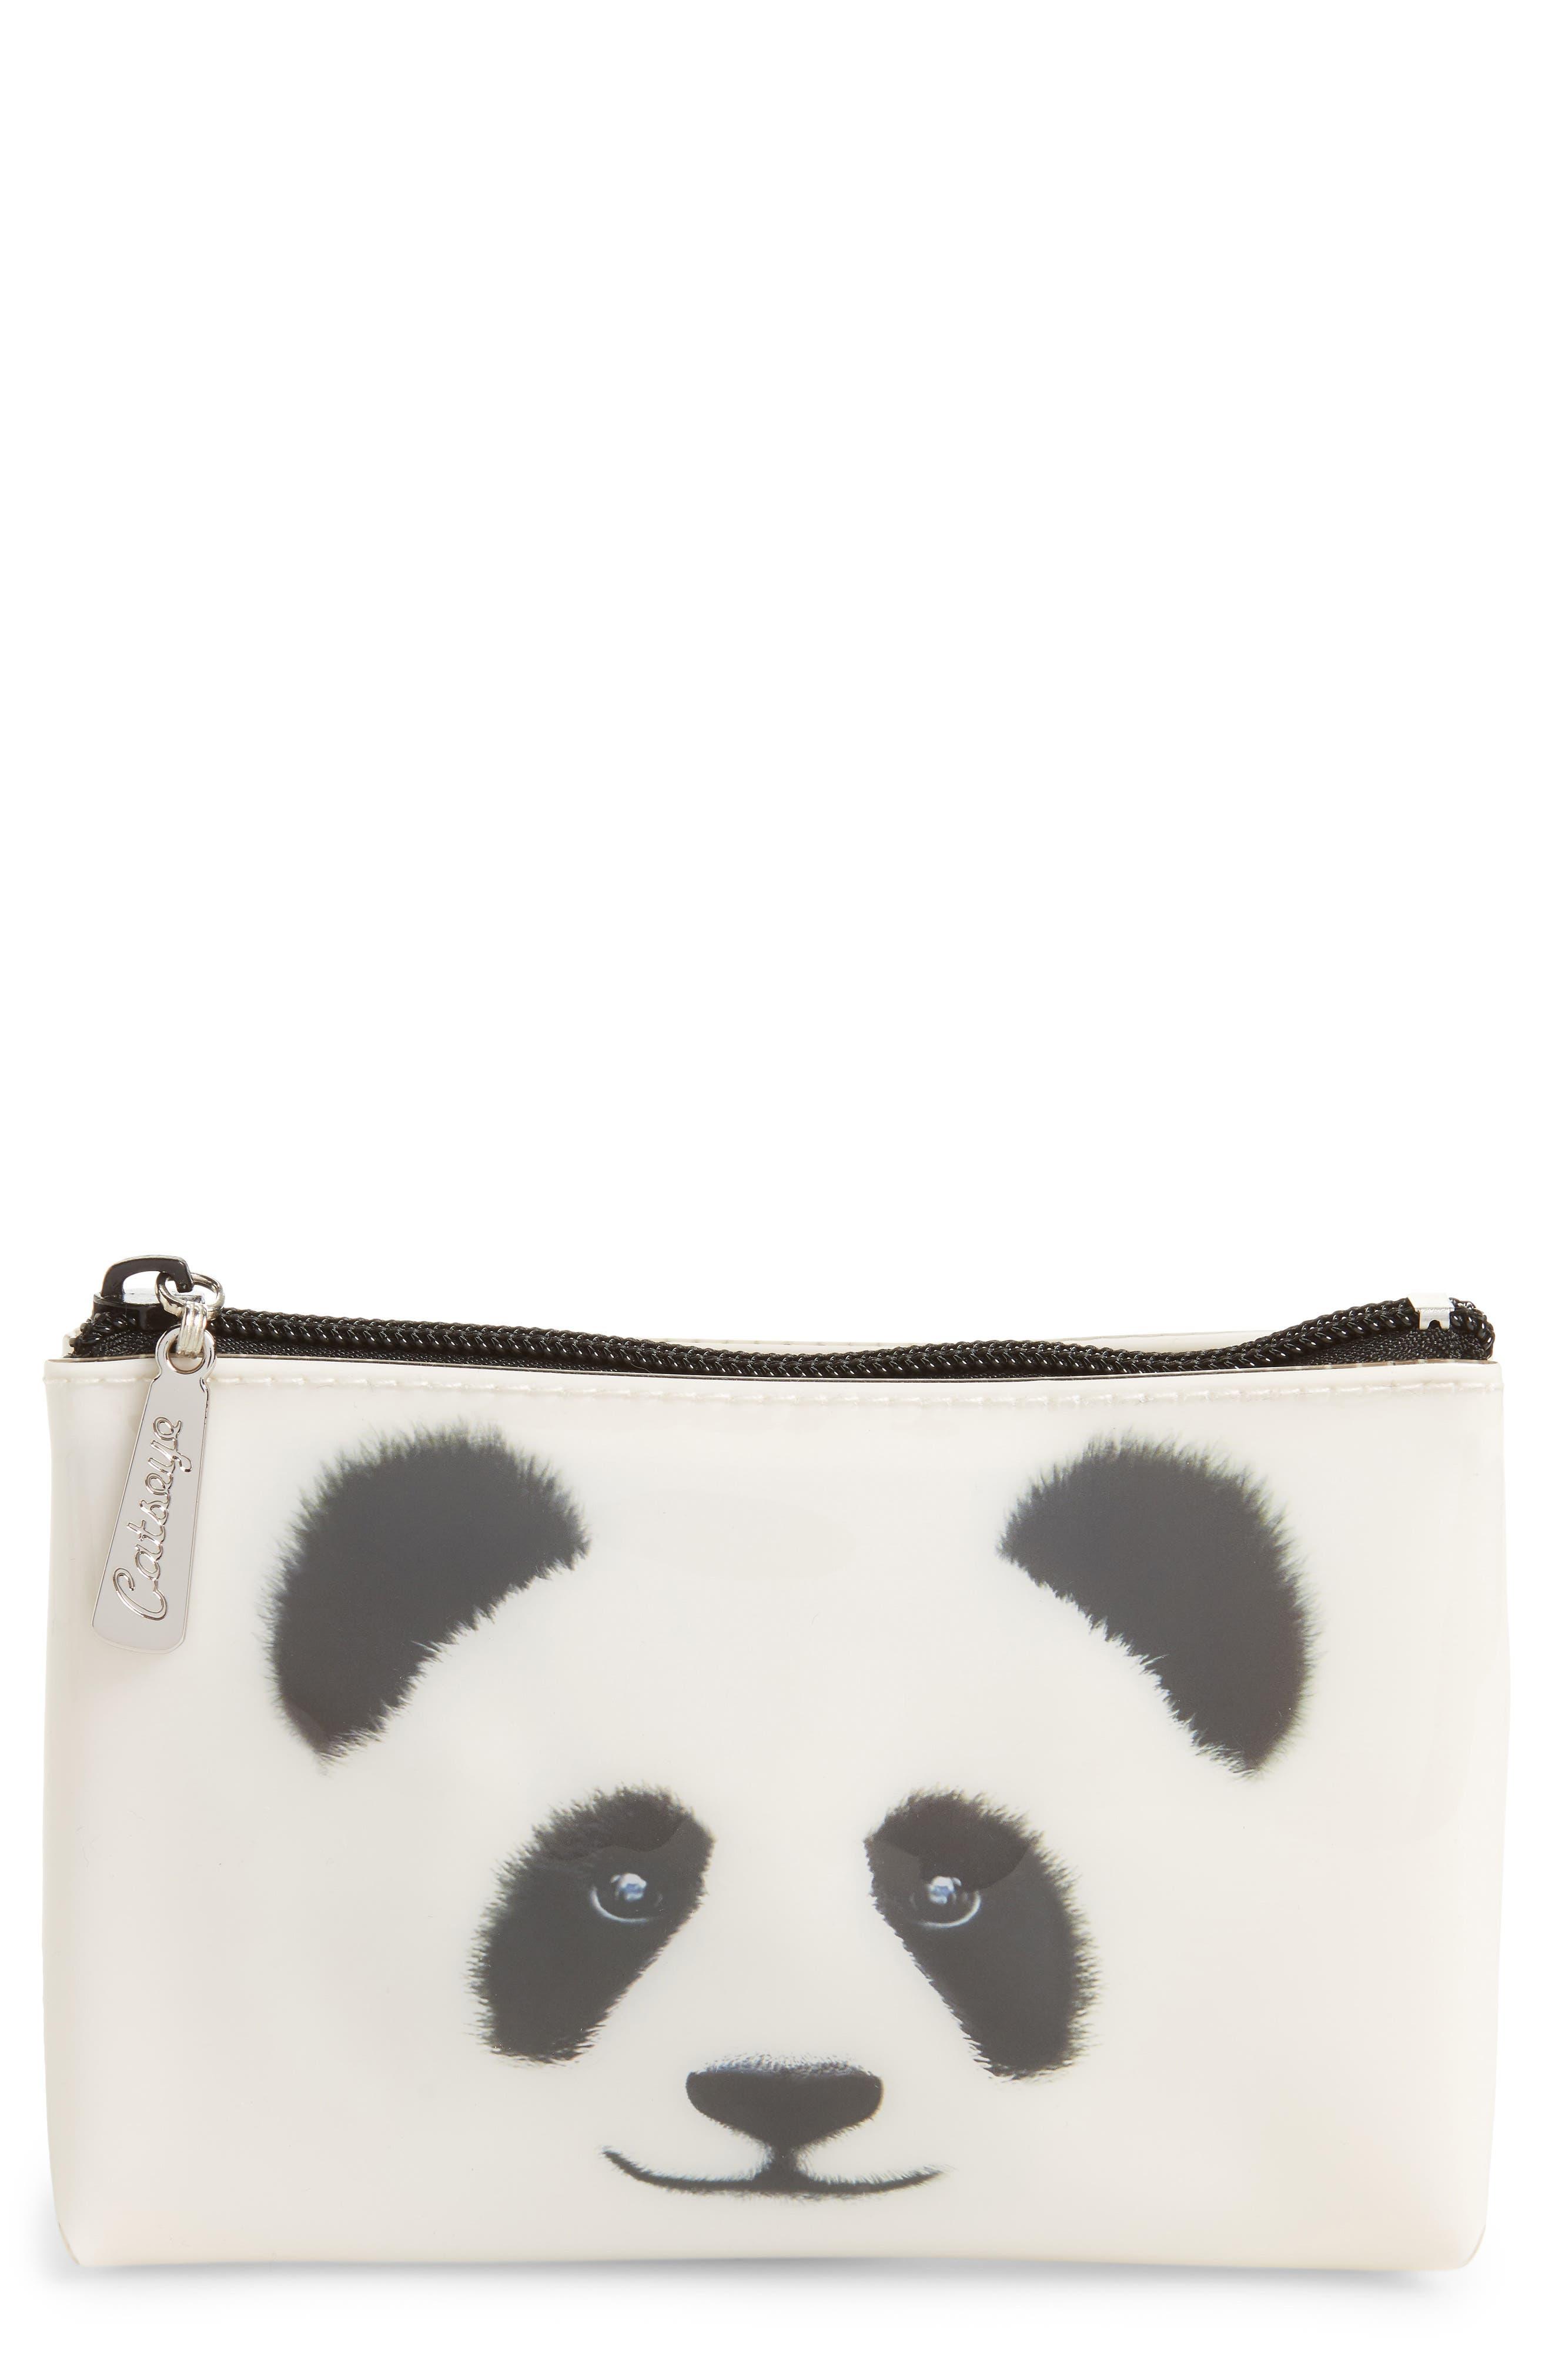 Catseye London Big Face Panda Cosmetics Case